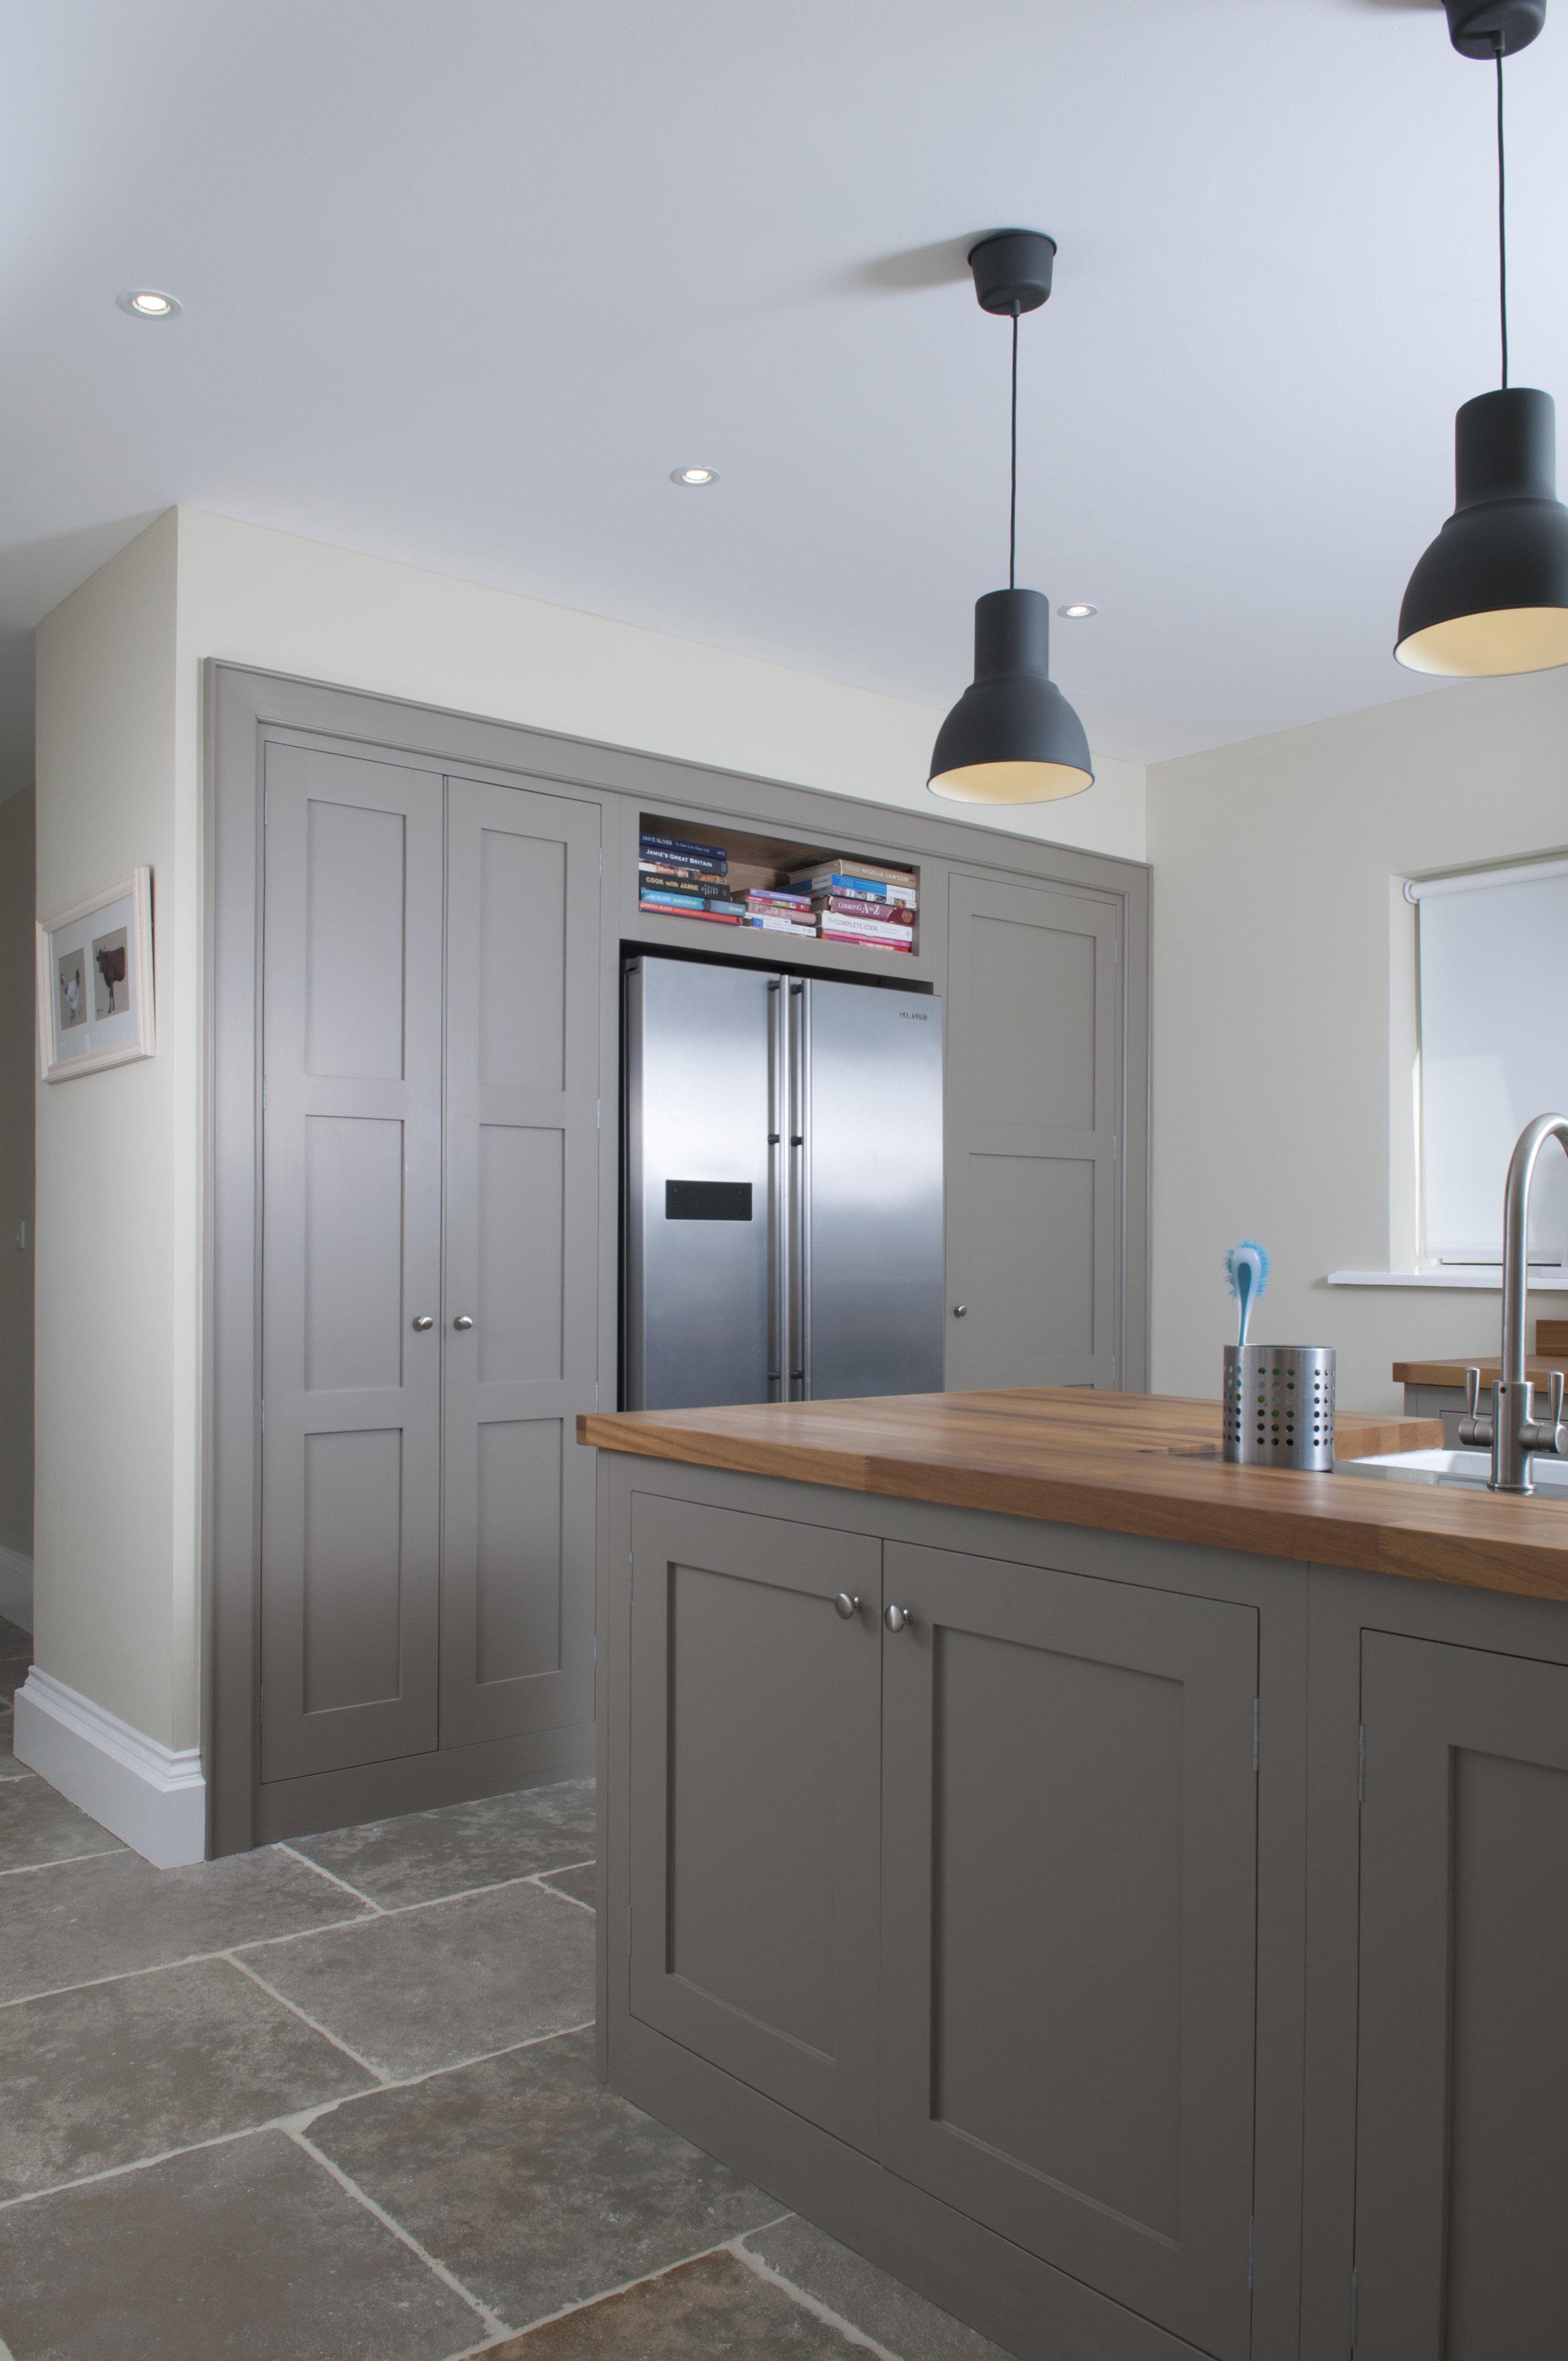 Talisman Woodworks Handcrafted Bespoke fridge unit kitchen